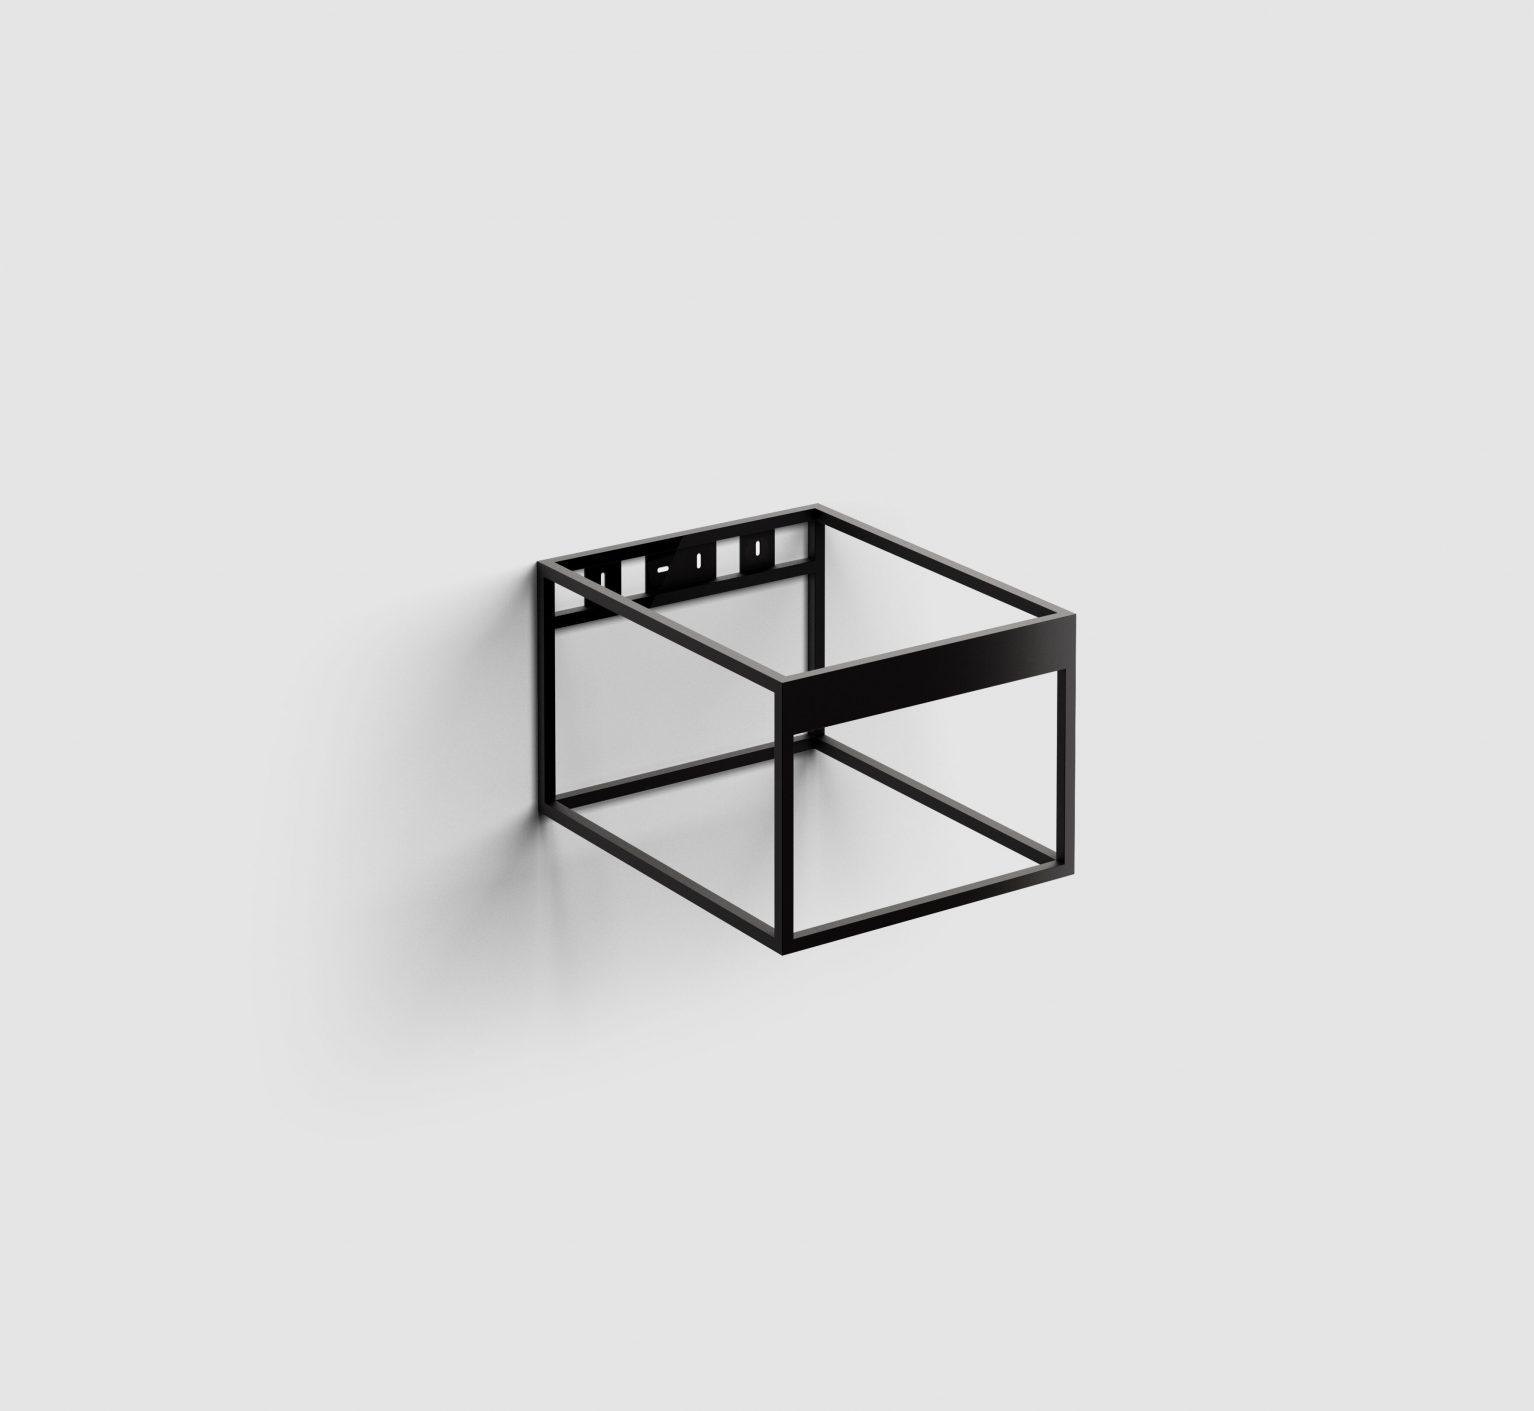 Hammock Frame rvs kokerprofielkast 40 cm, mat zwart poederc.)